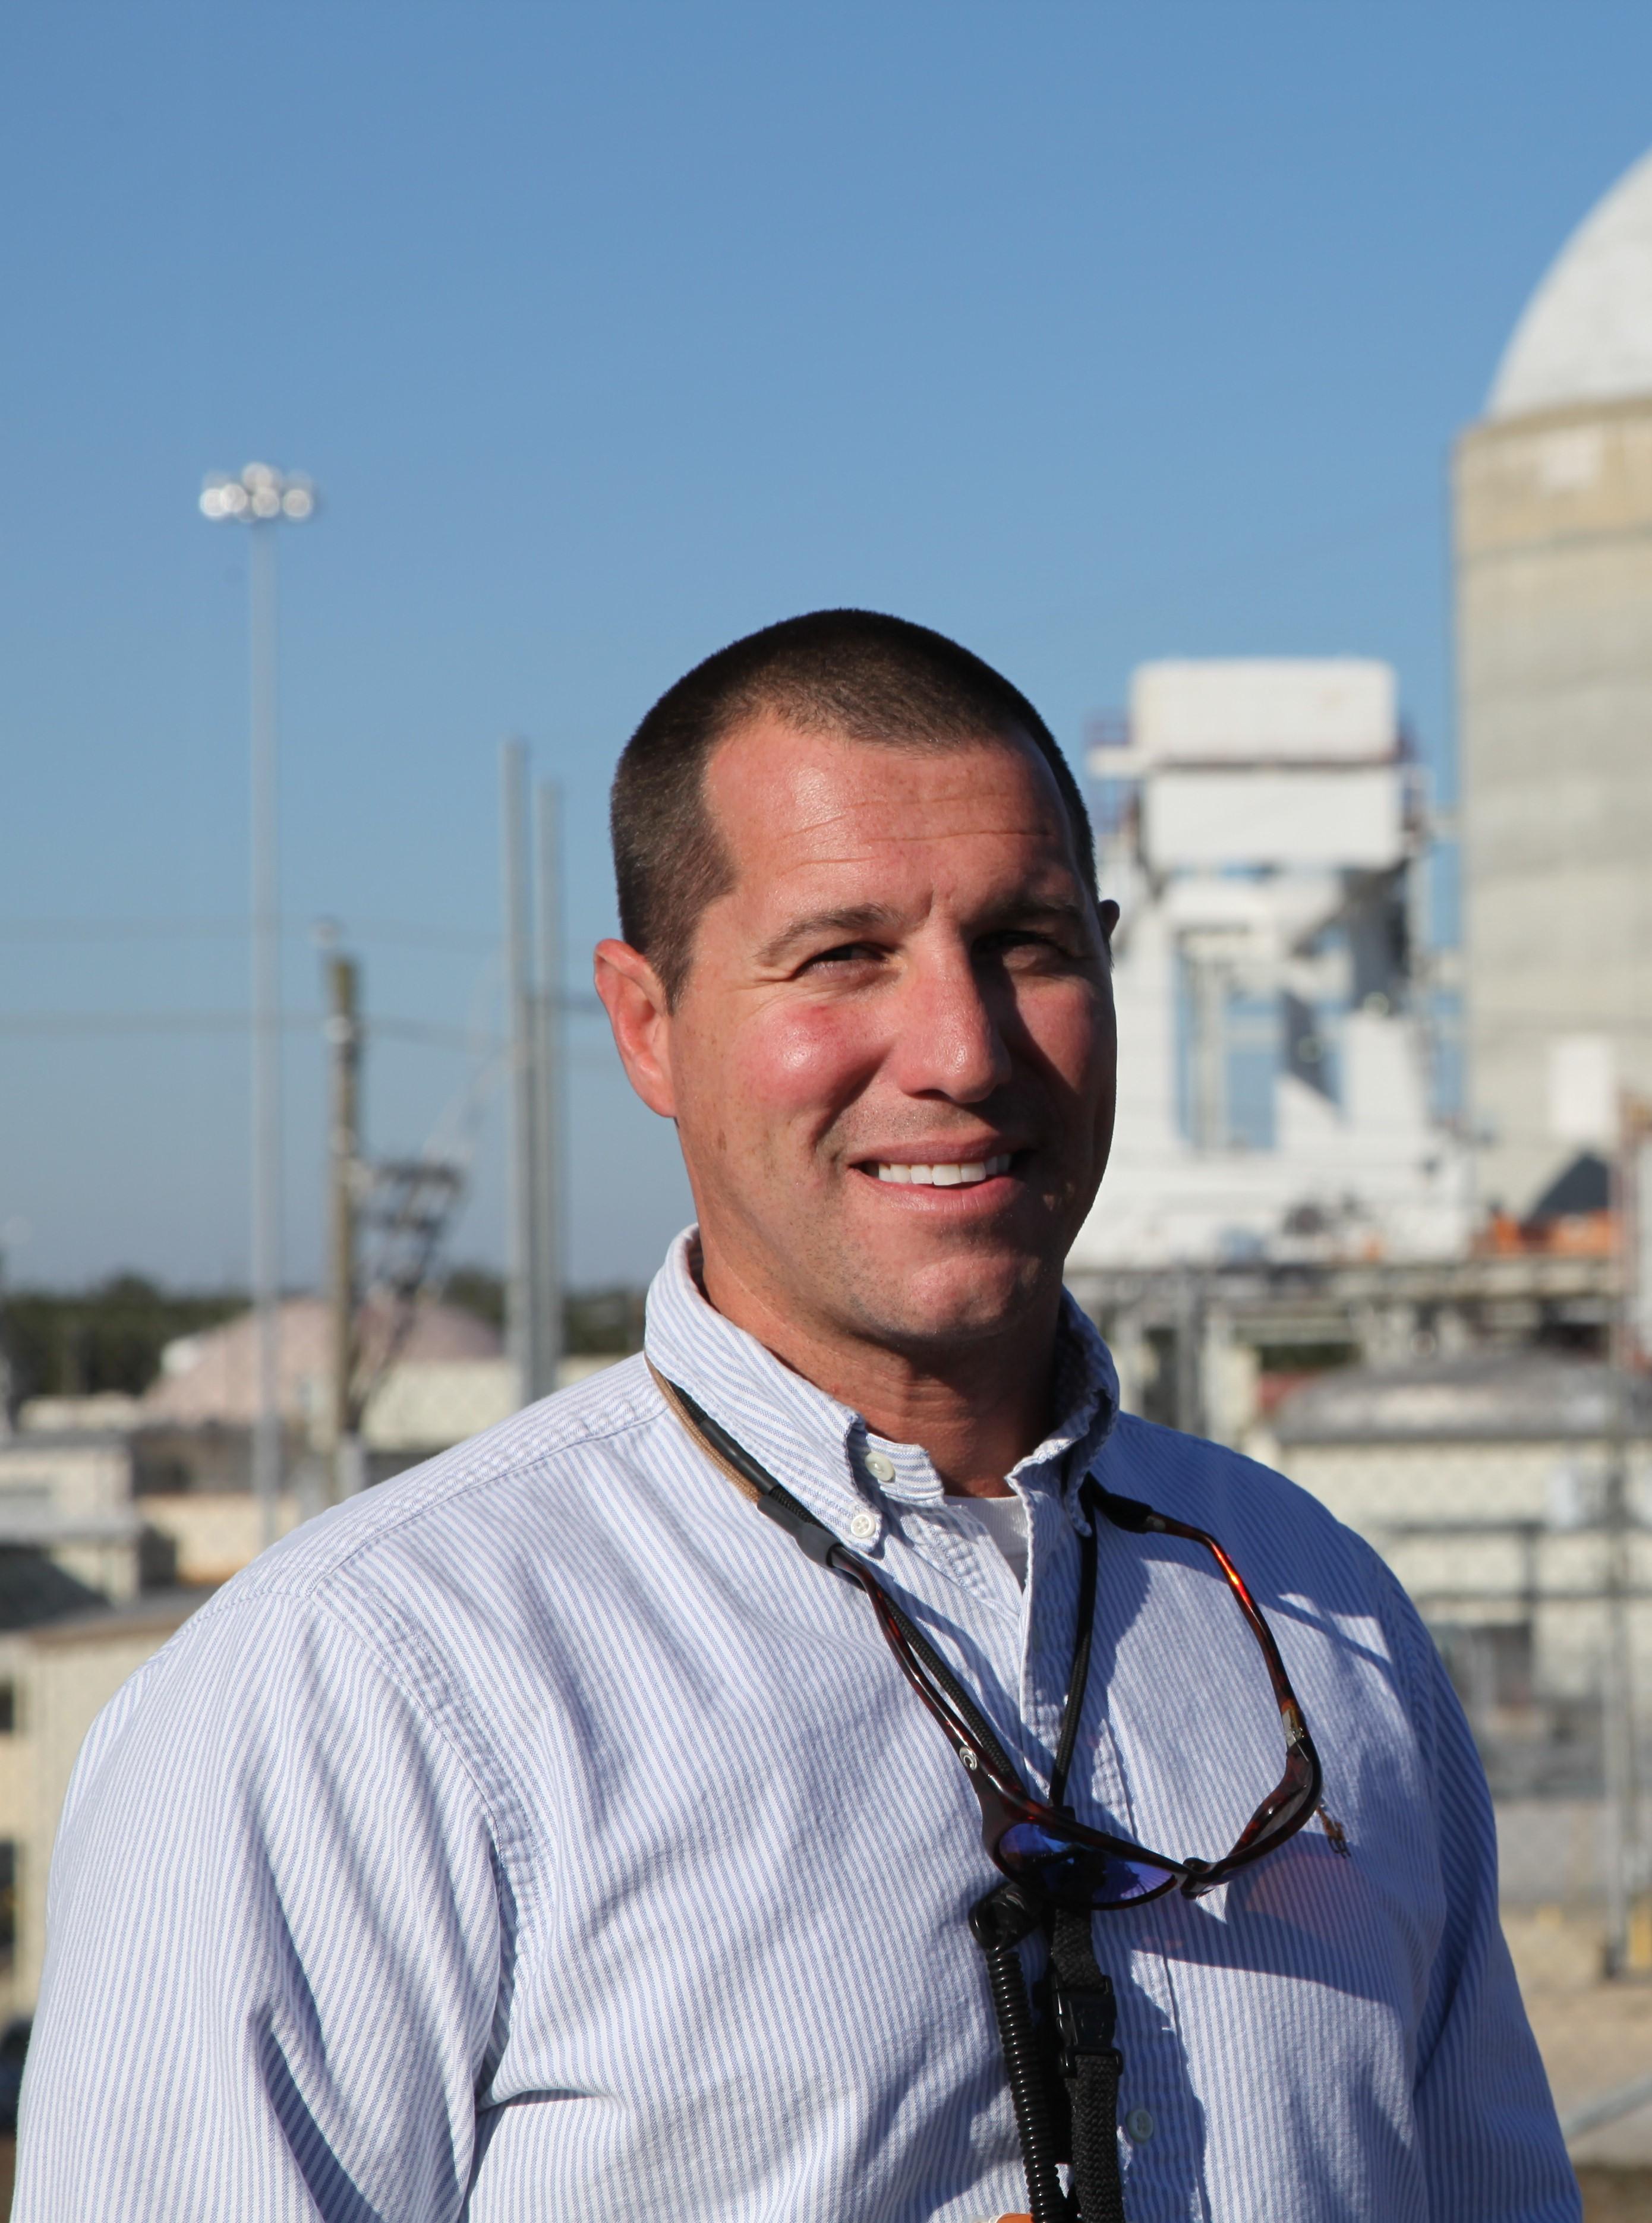 Will Hamilton, Robinson Nuclear Plant's environmental representative